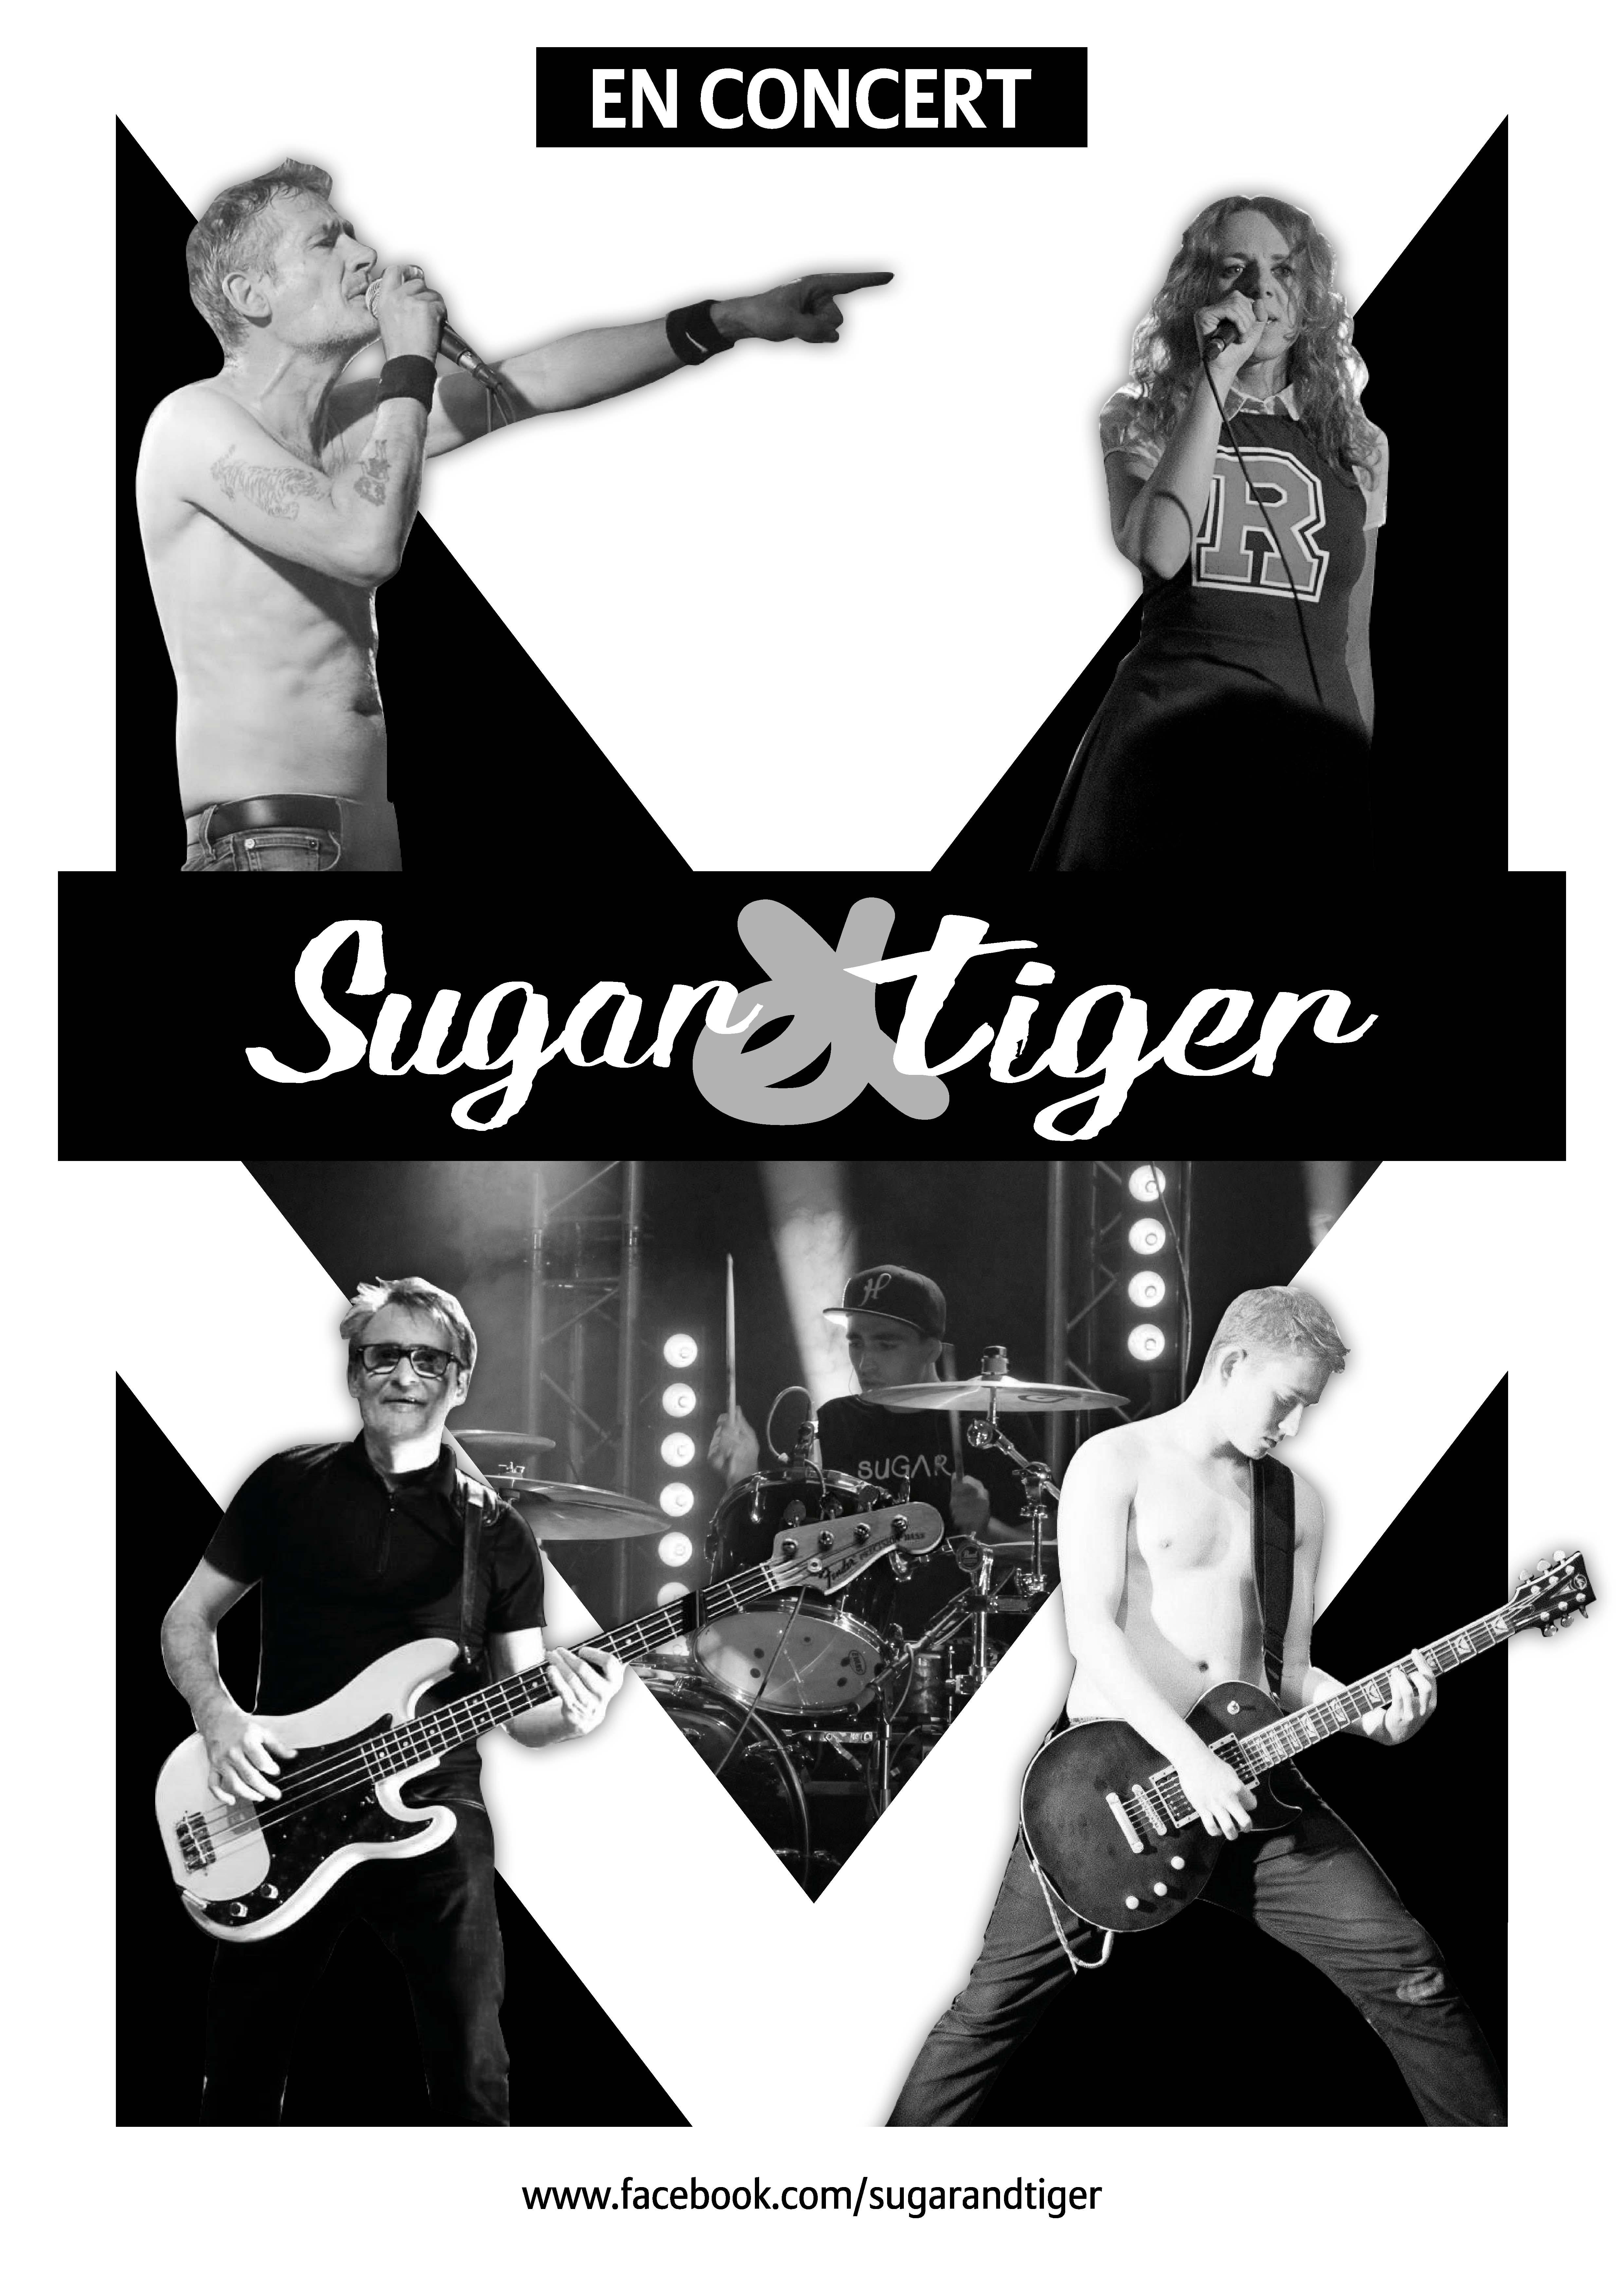 Sugar&Tiger Affiche En Concert Edwing Wo